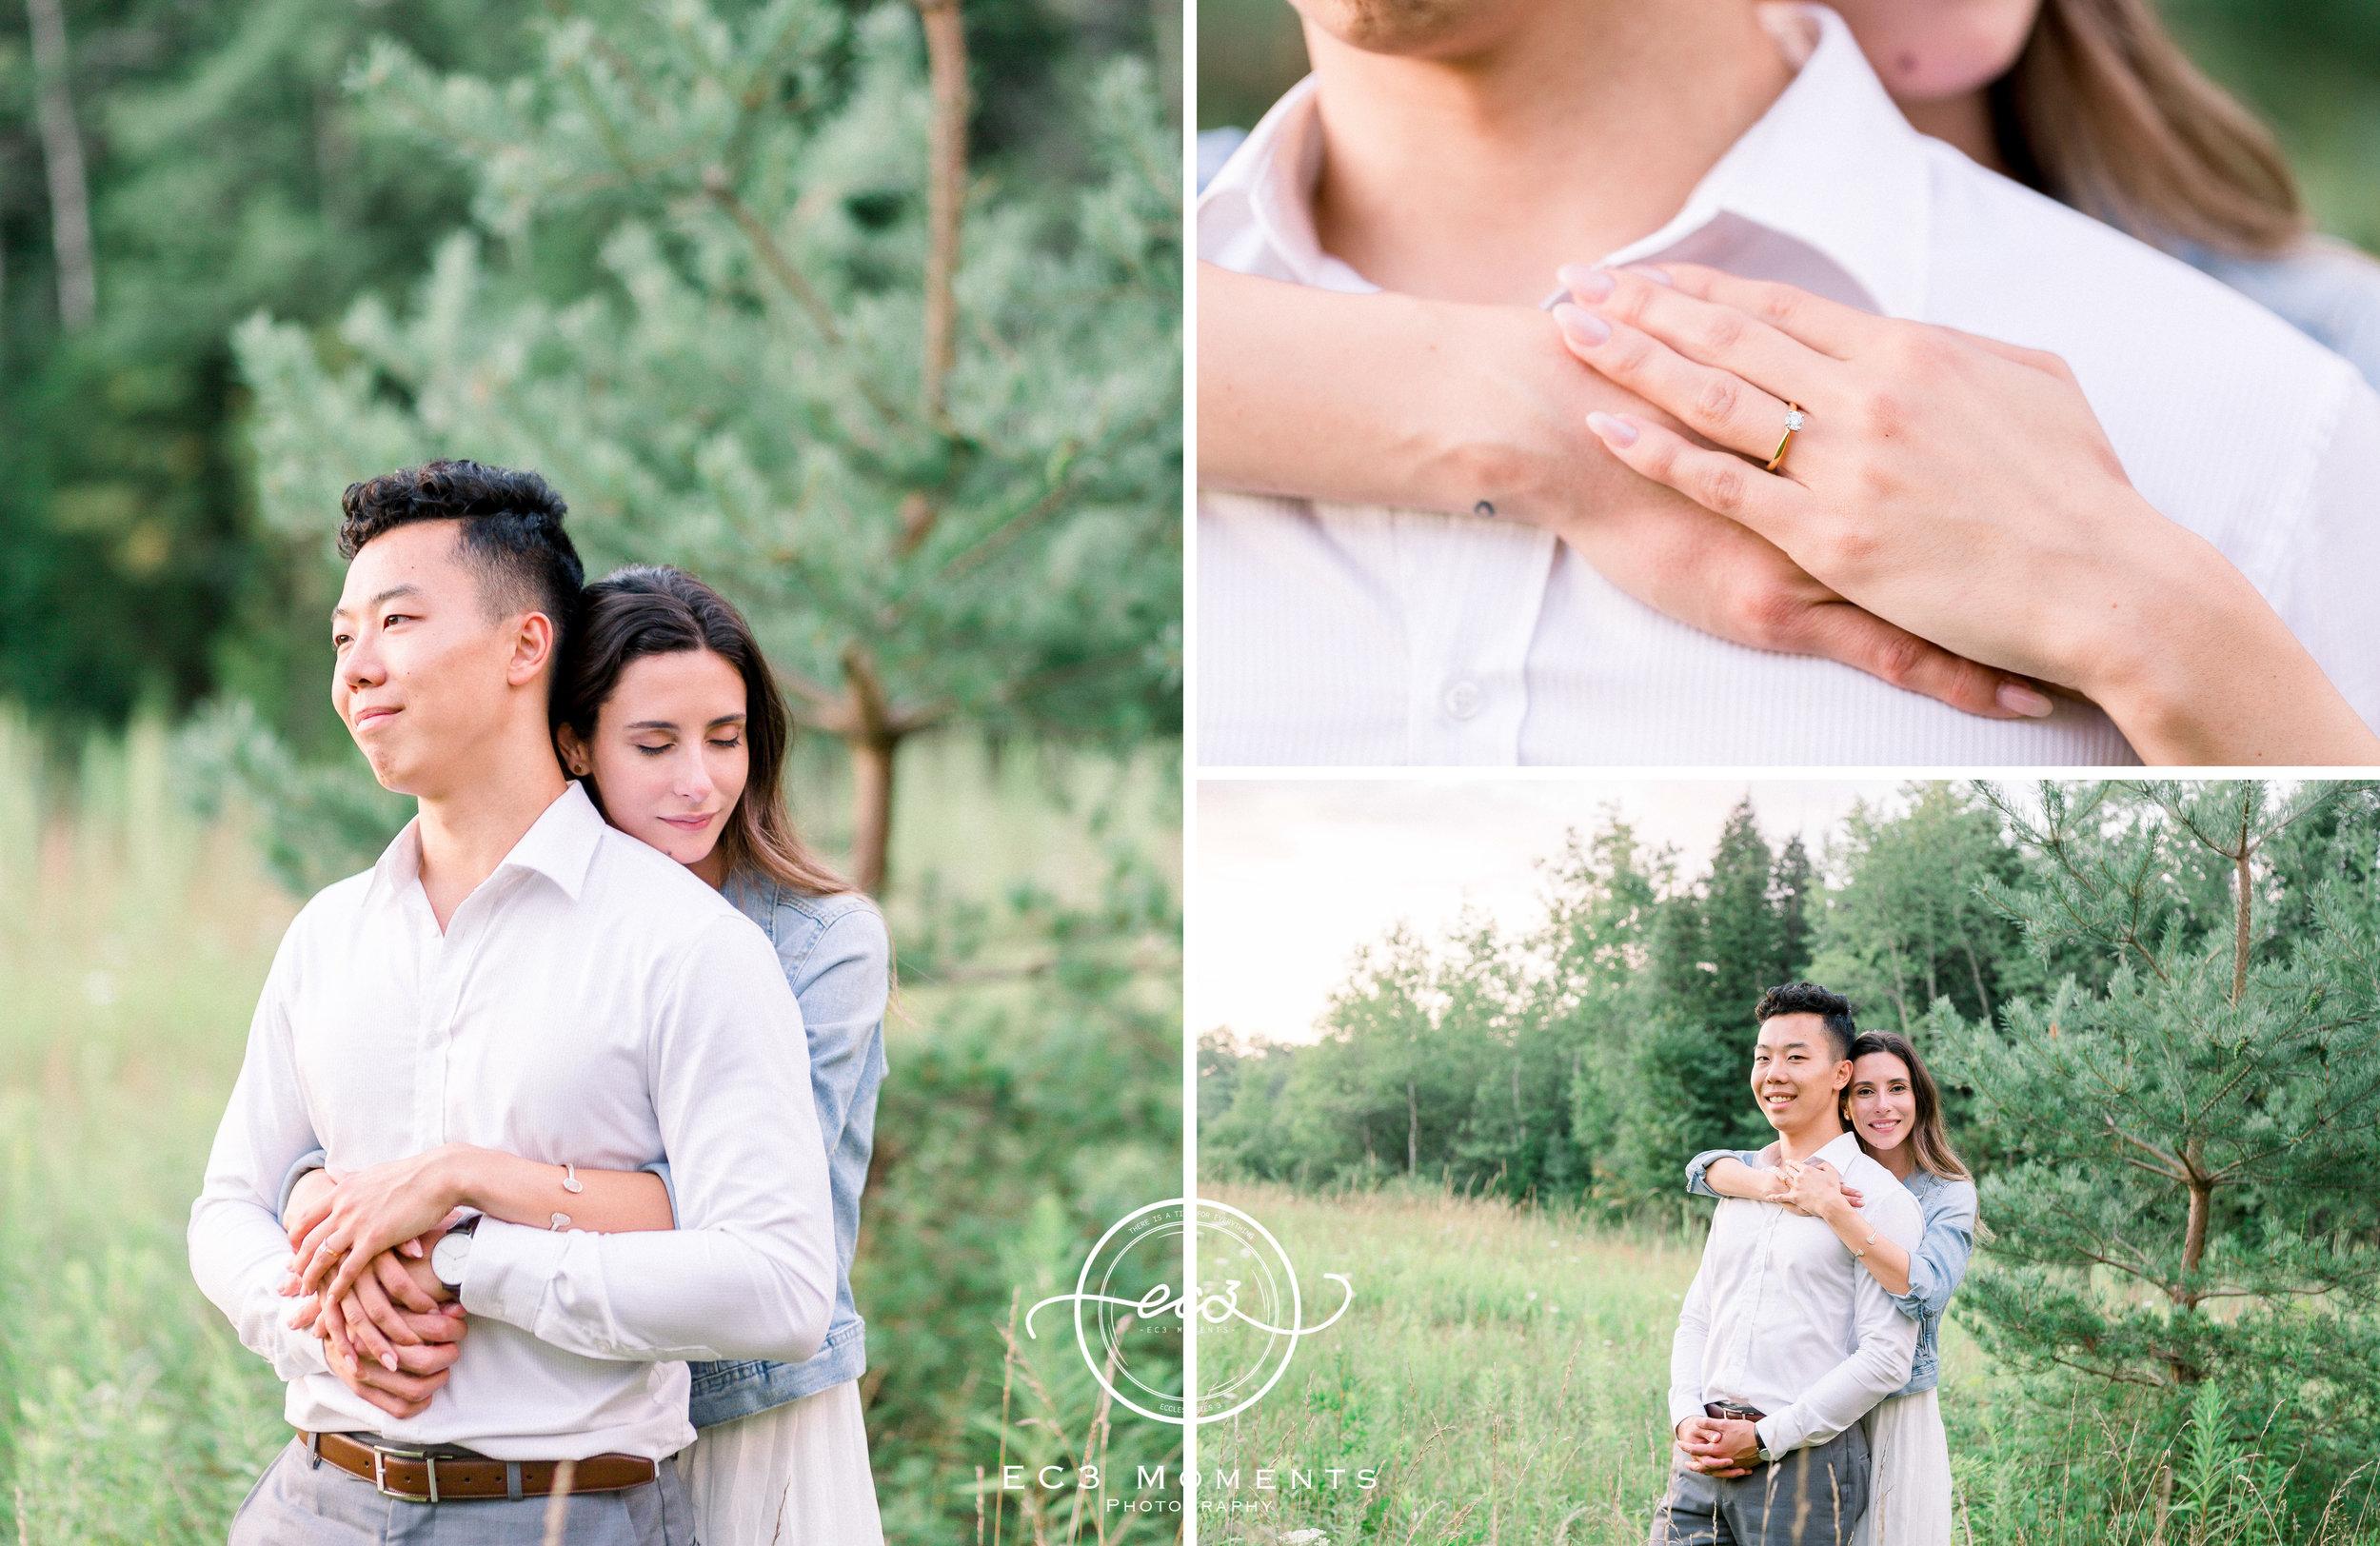 Laura & Ryan Terre Bleu Summer Surprise Proposal 21.jpg